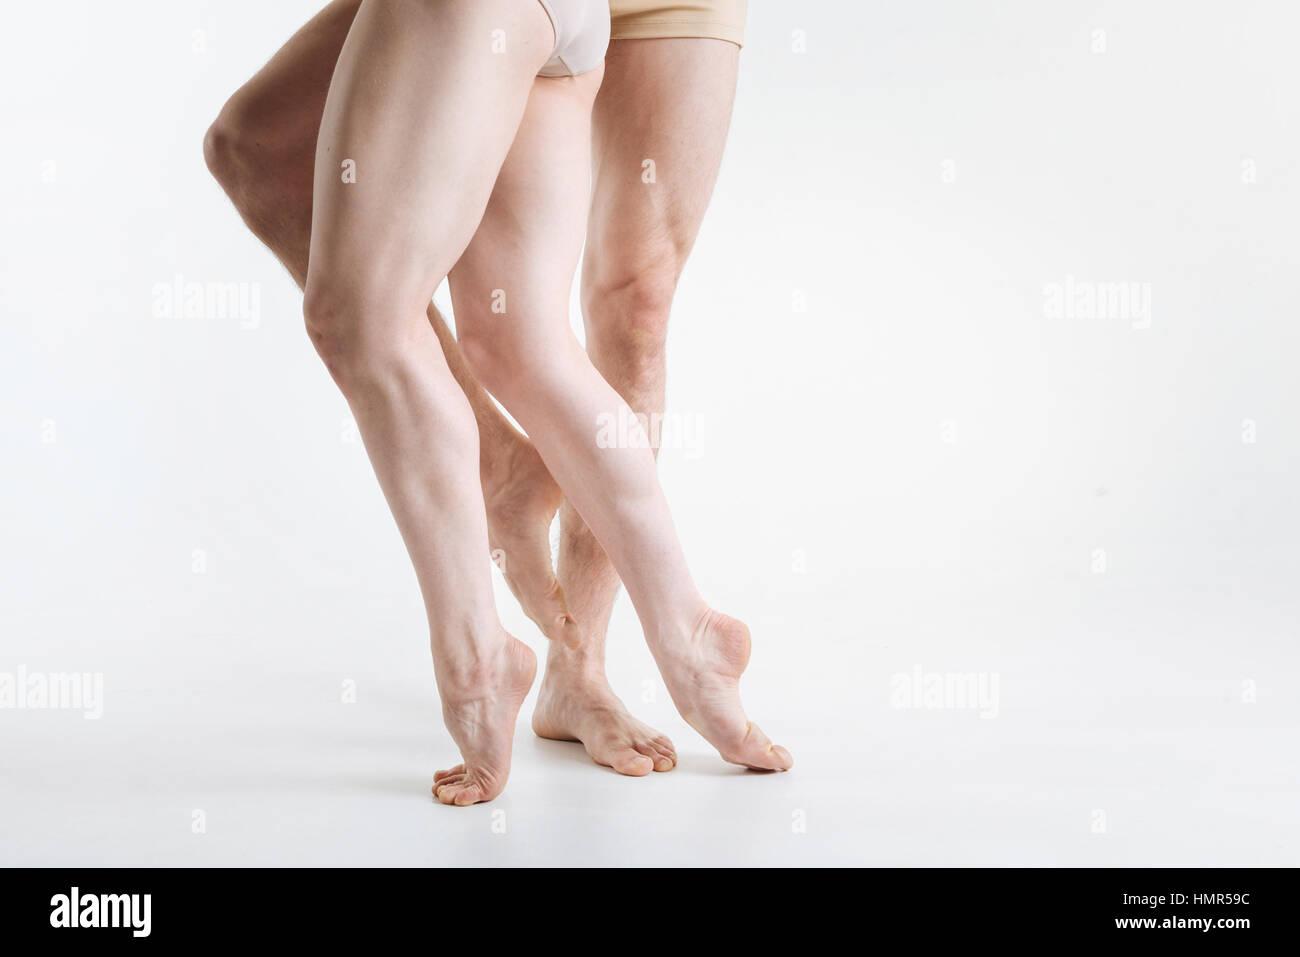 Muscular ballet dancers legs in the white studio - Stock Image